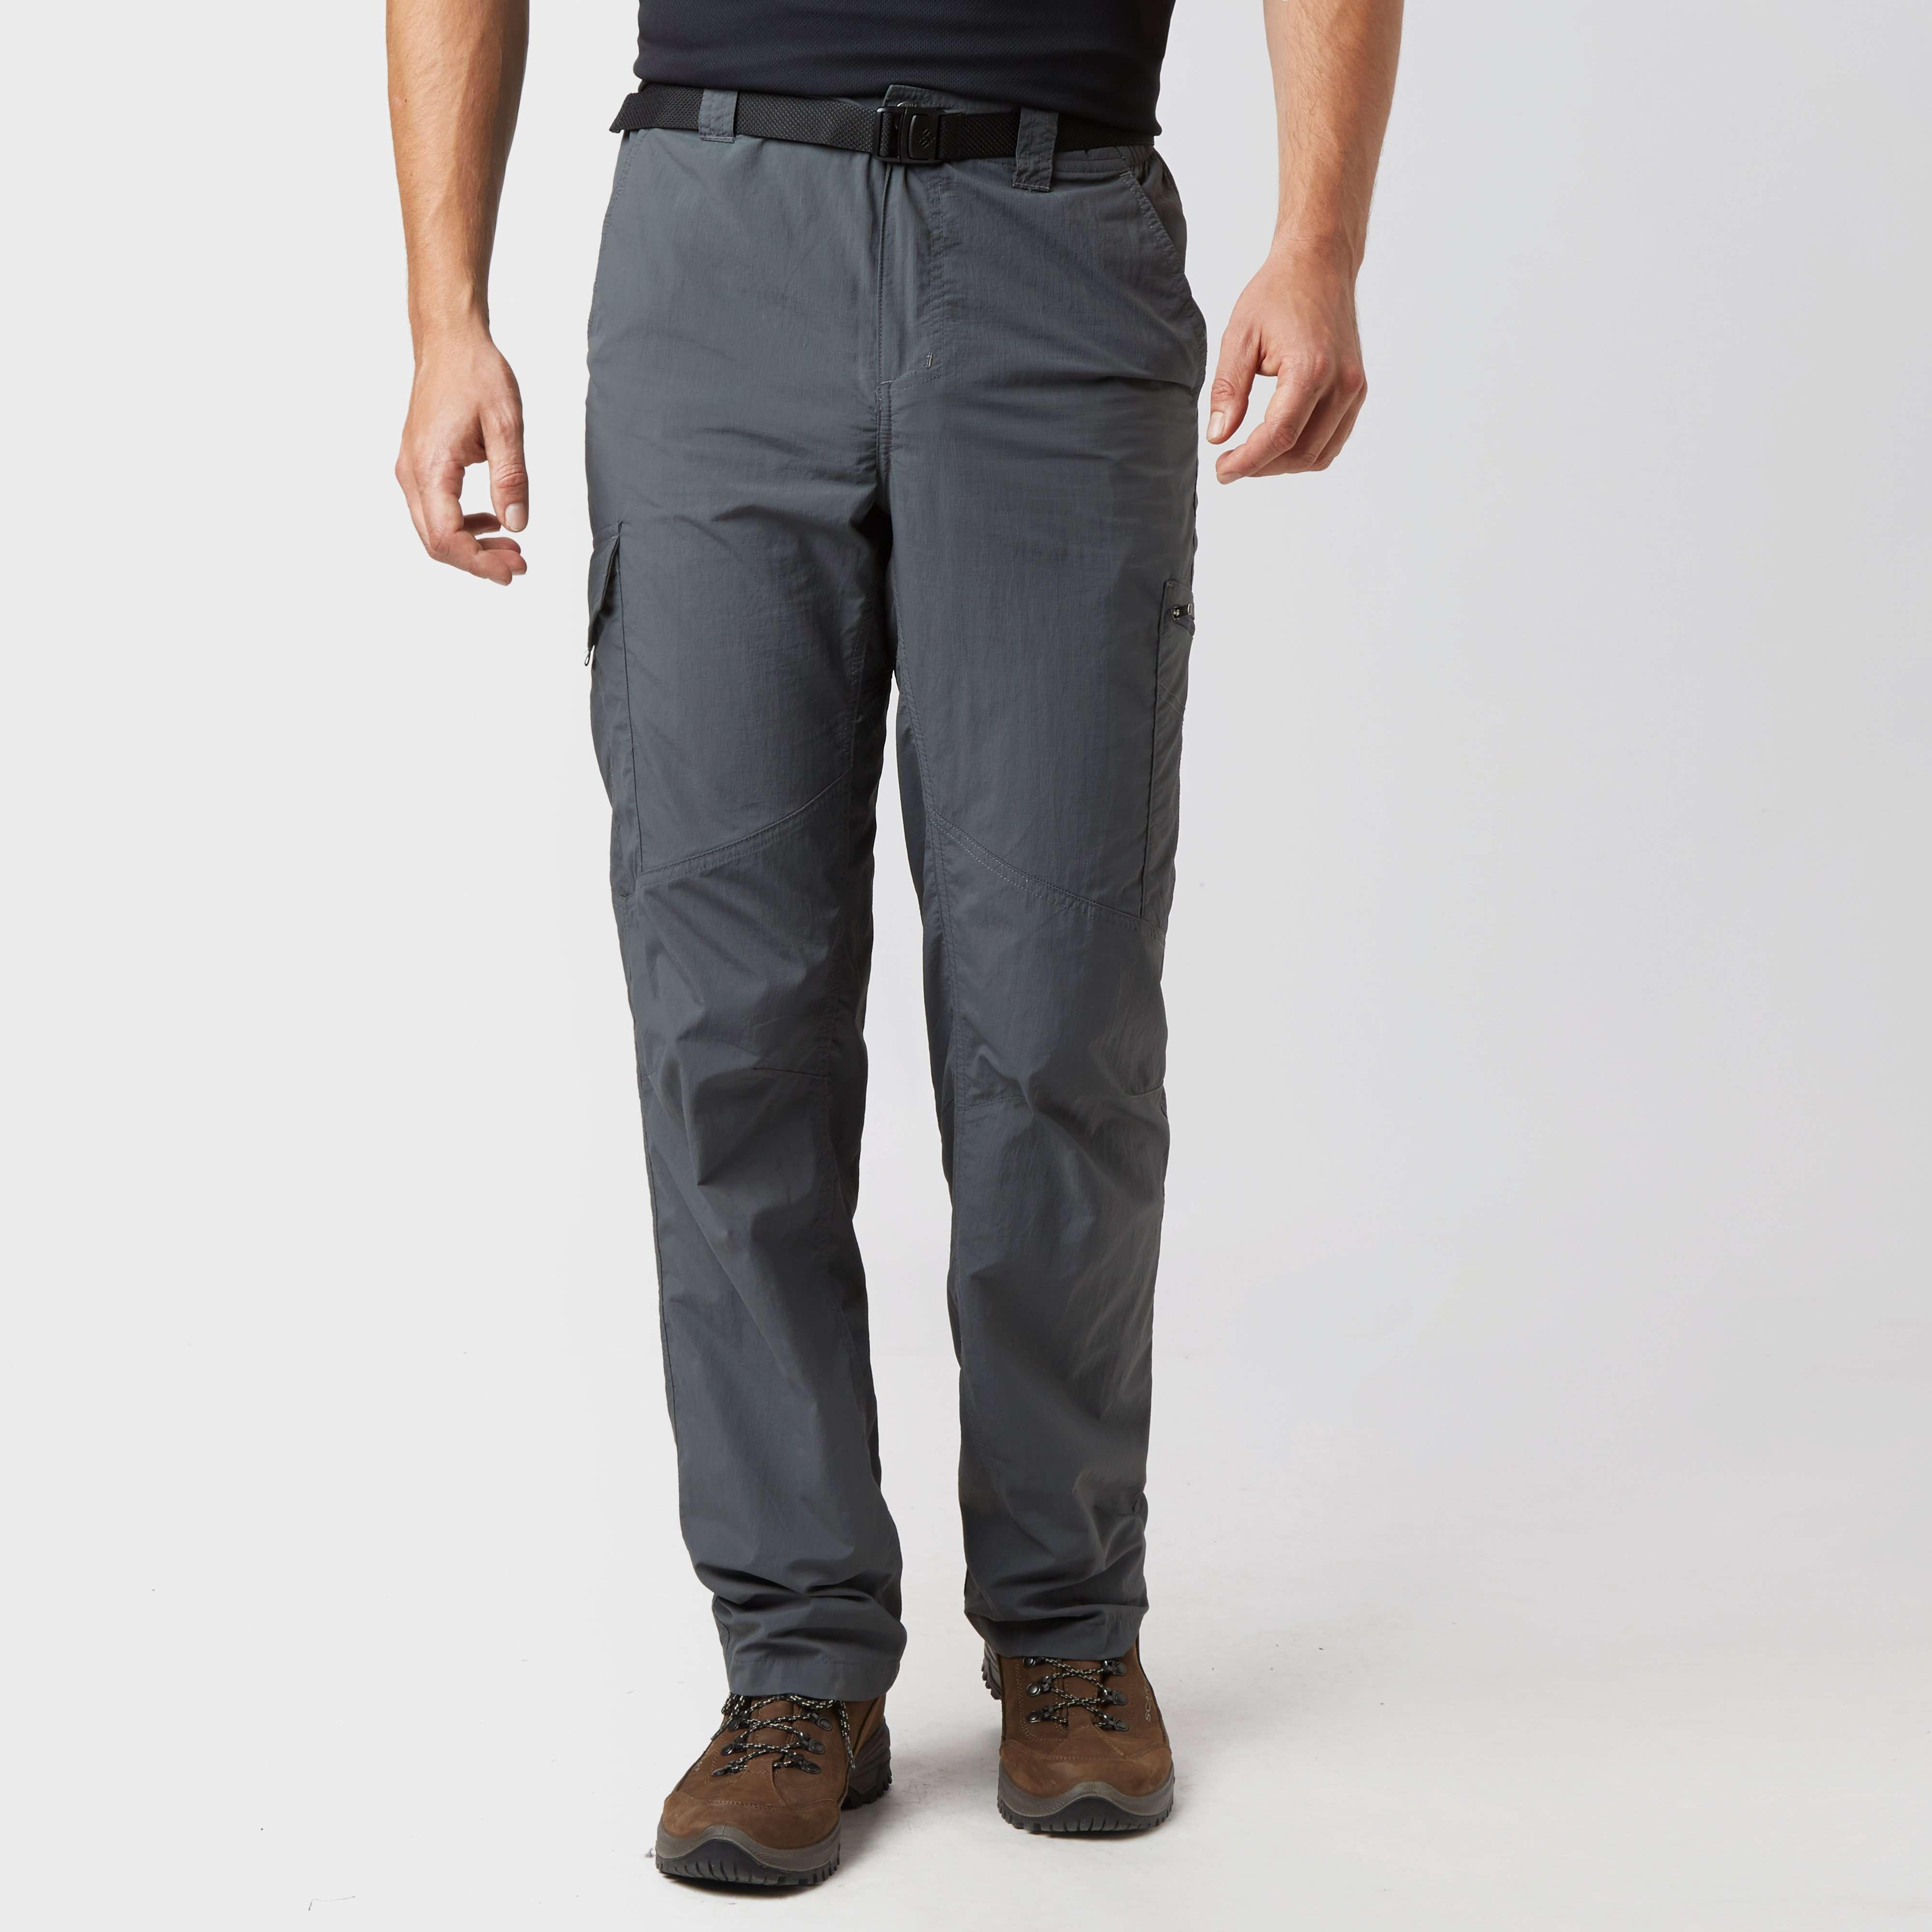 COLUMBIA Men's Silver Ridge™ Cargo Trousers